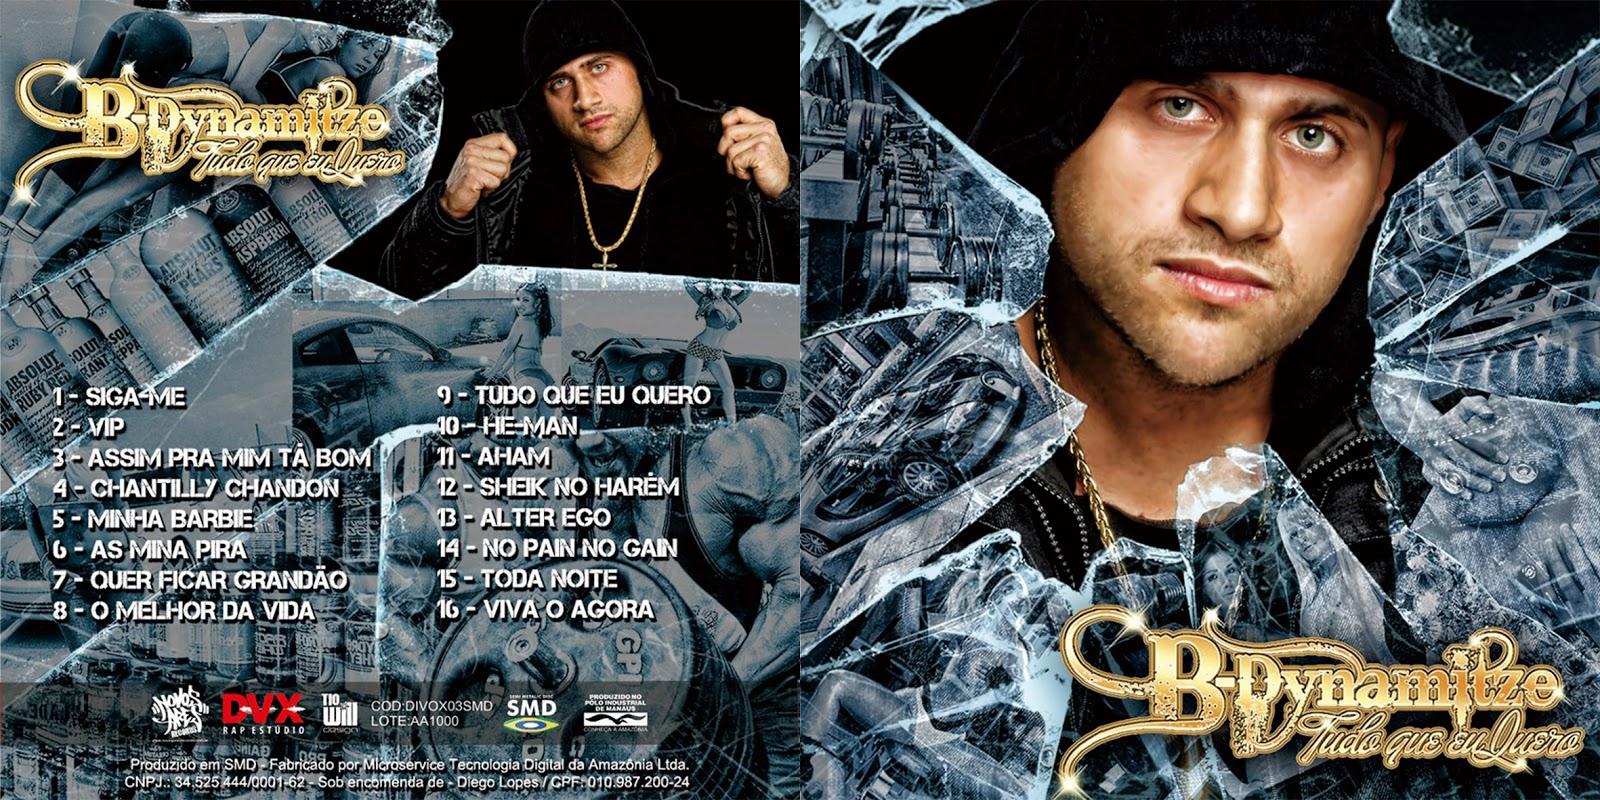 b-dynamitze cd